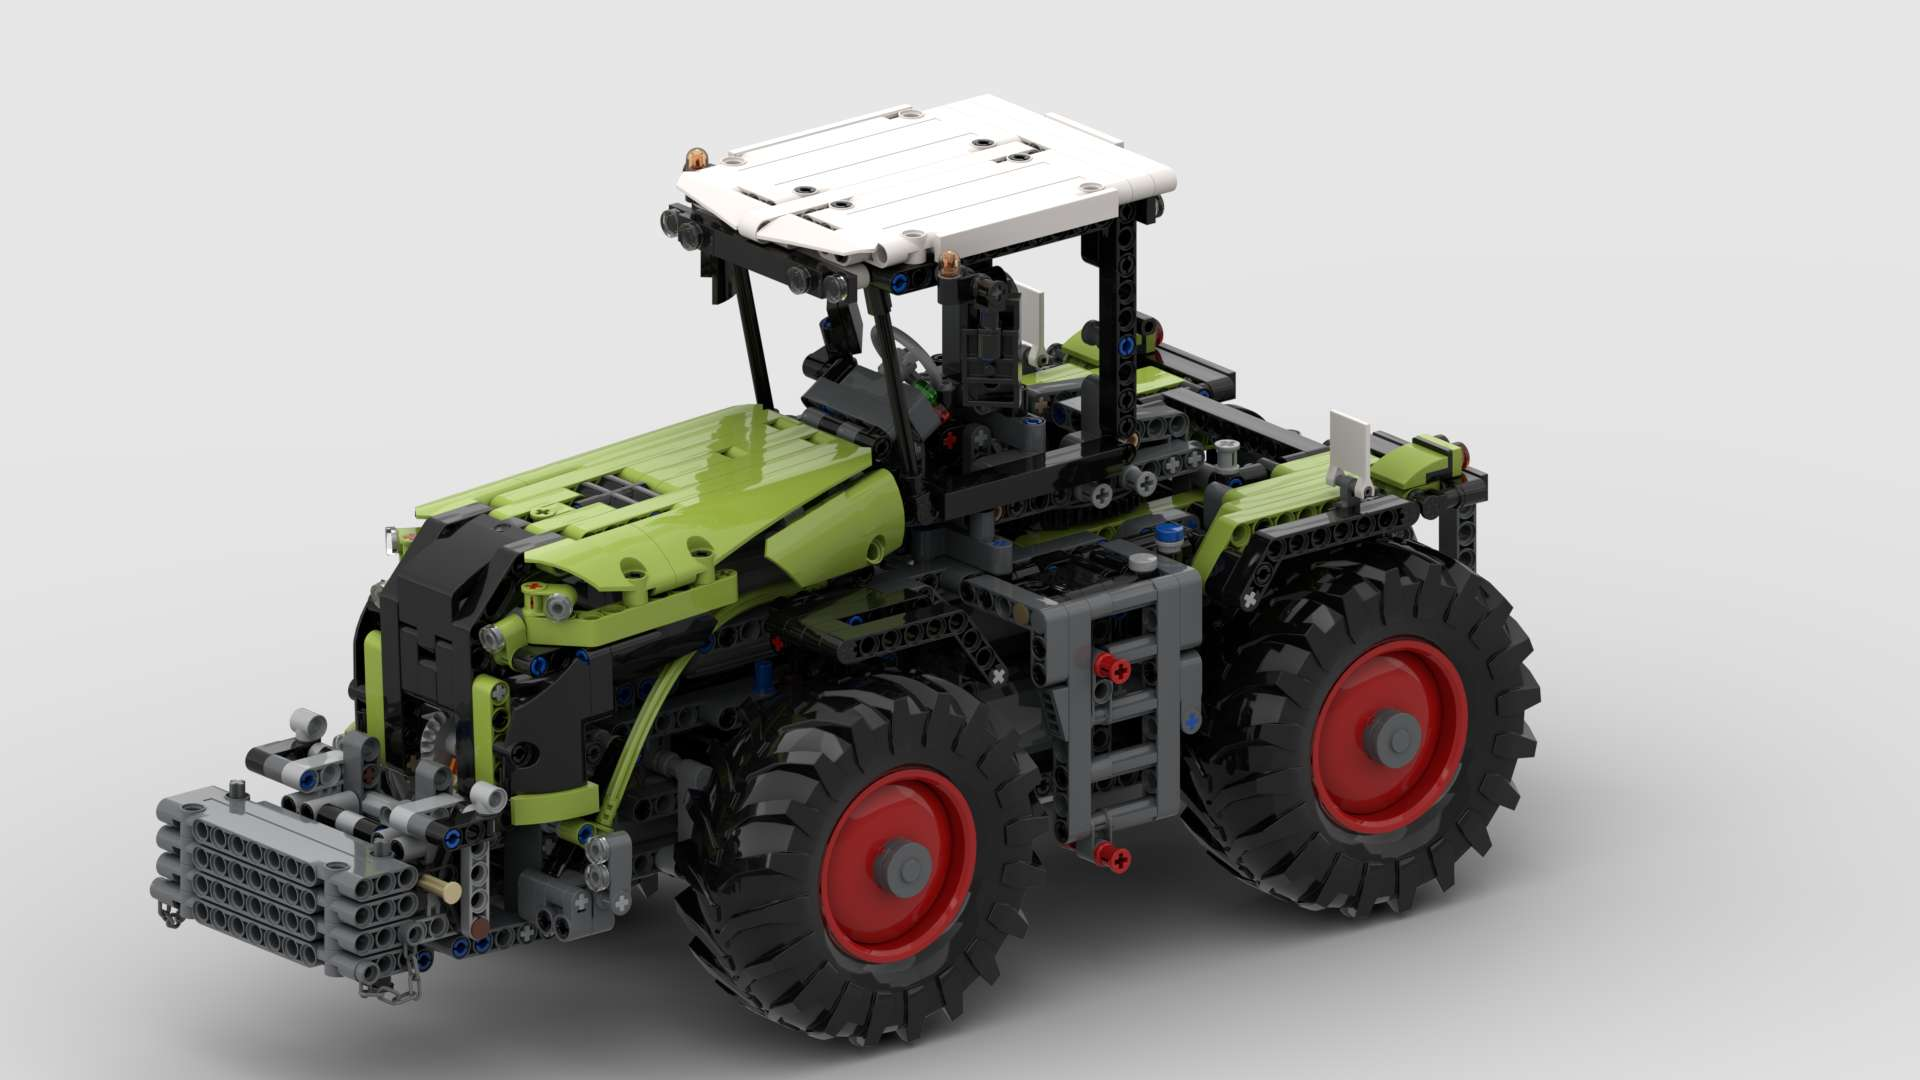 00 42054 Rc Original Xerion 5000 VC 7 Motoren MOD